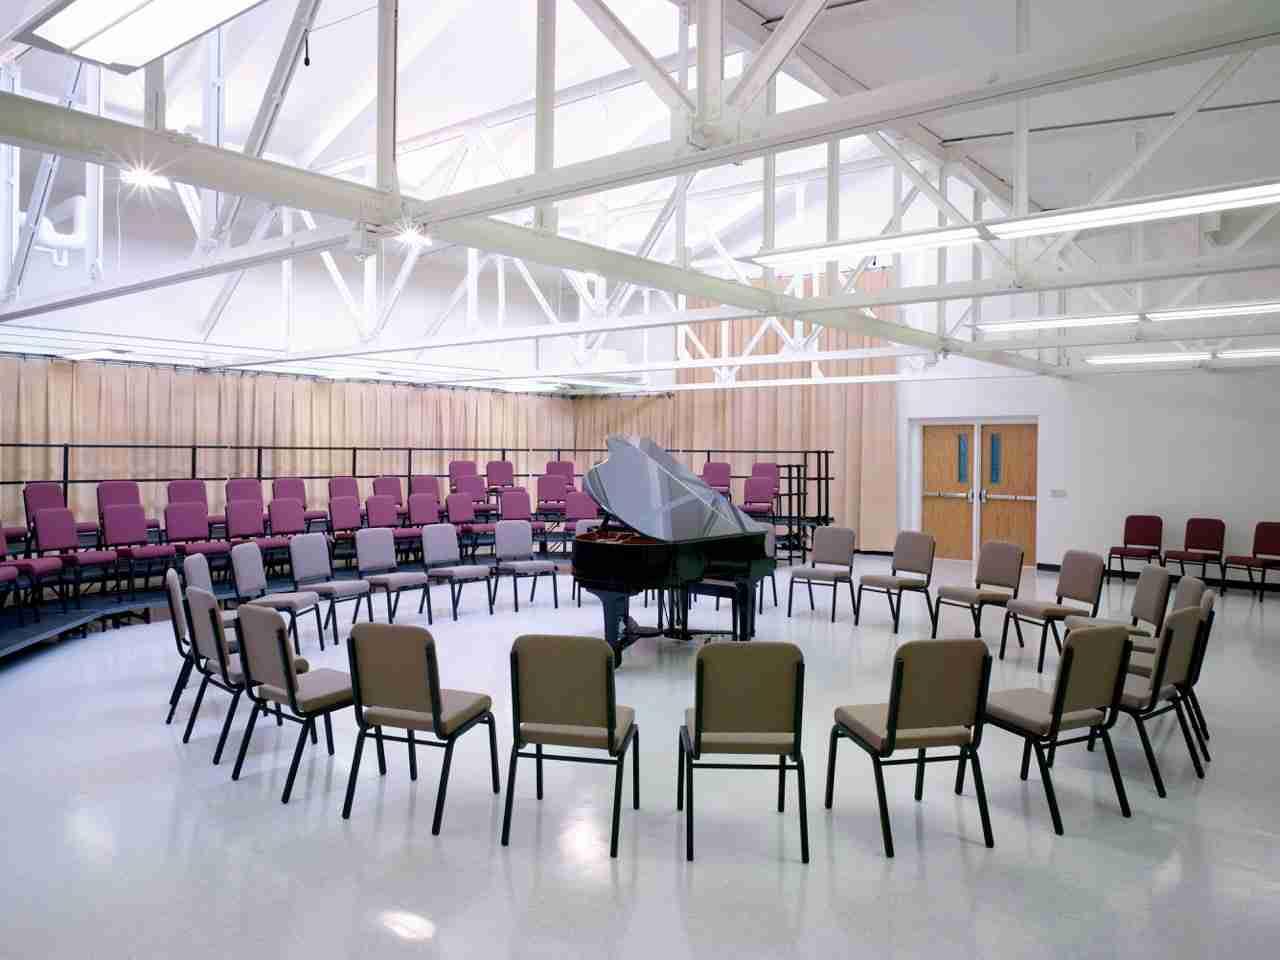 Beloit-College-Hendricks-Center-for-the-Arts